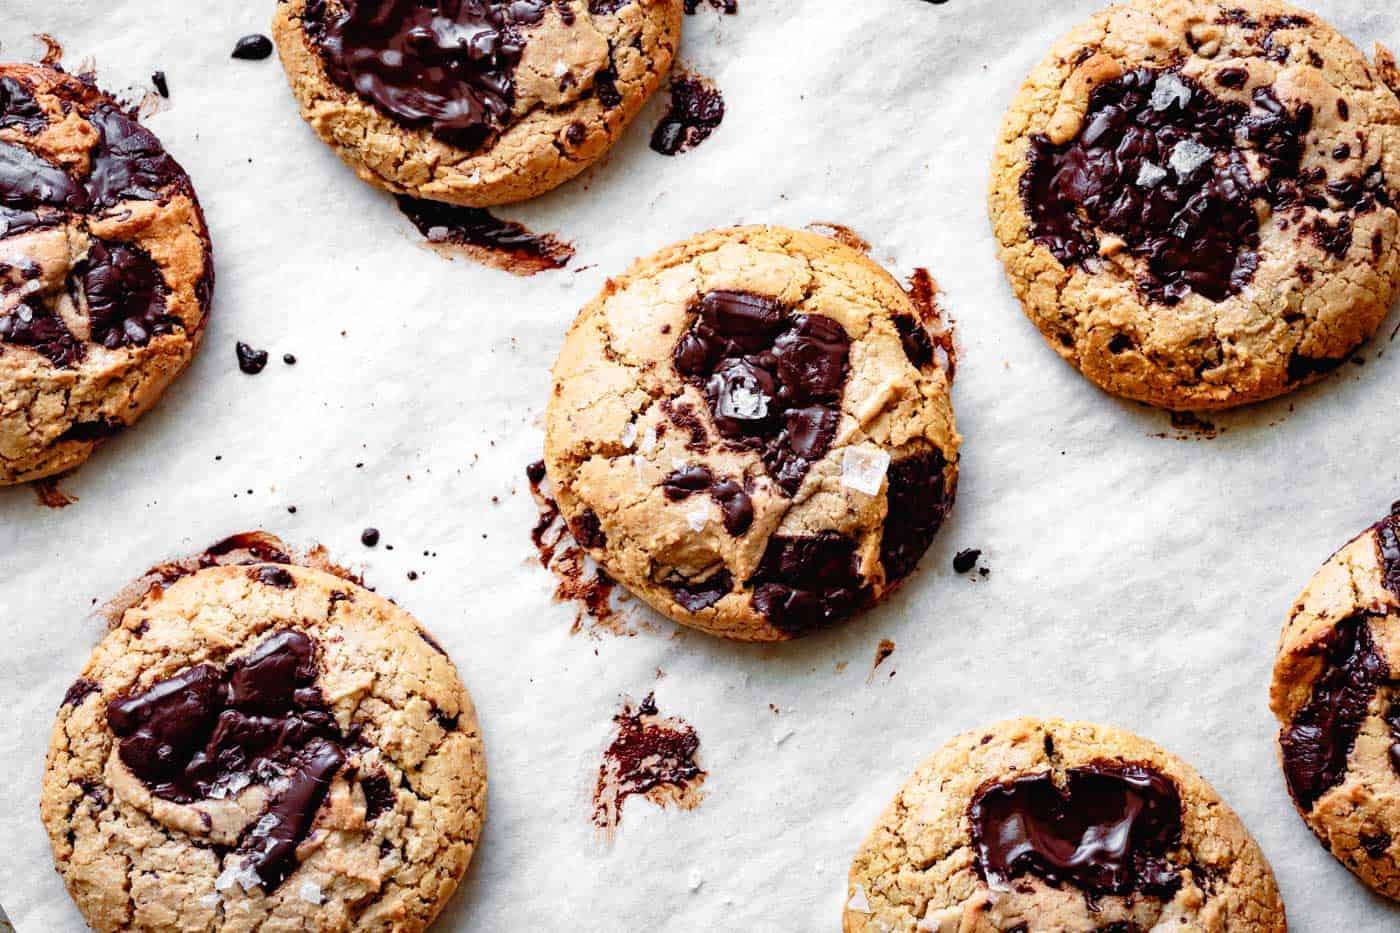 gluten-free vegan chocolate chip cookies on a baking sheet